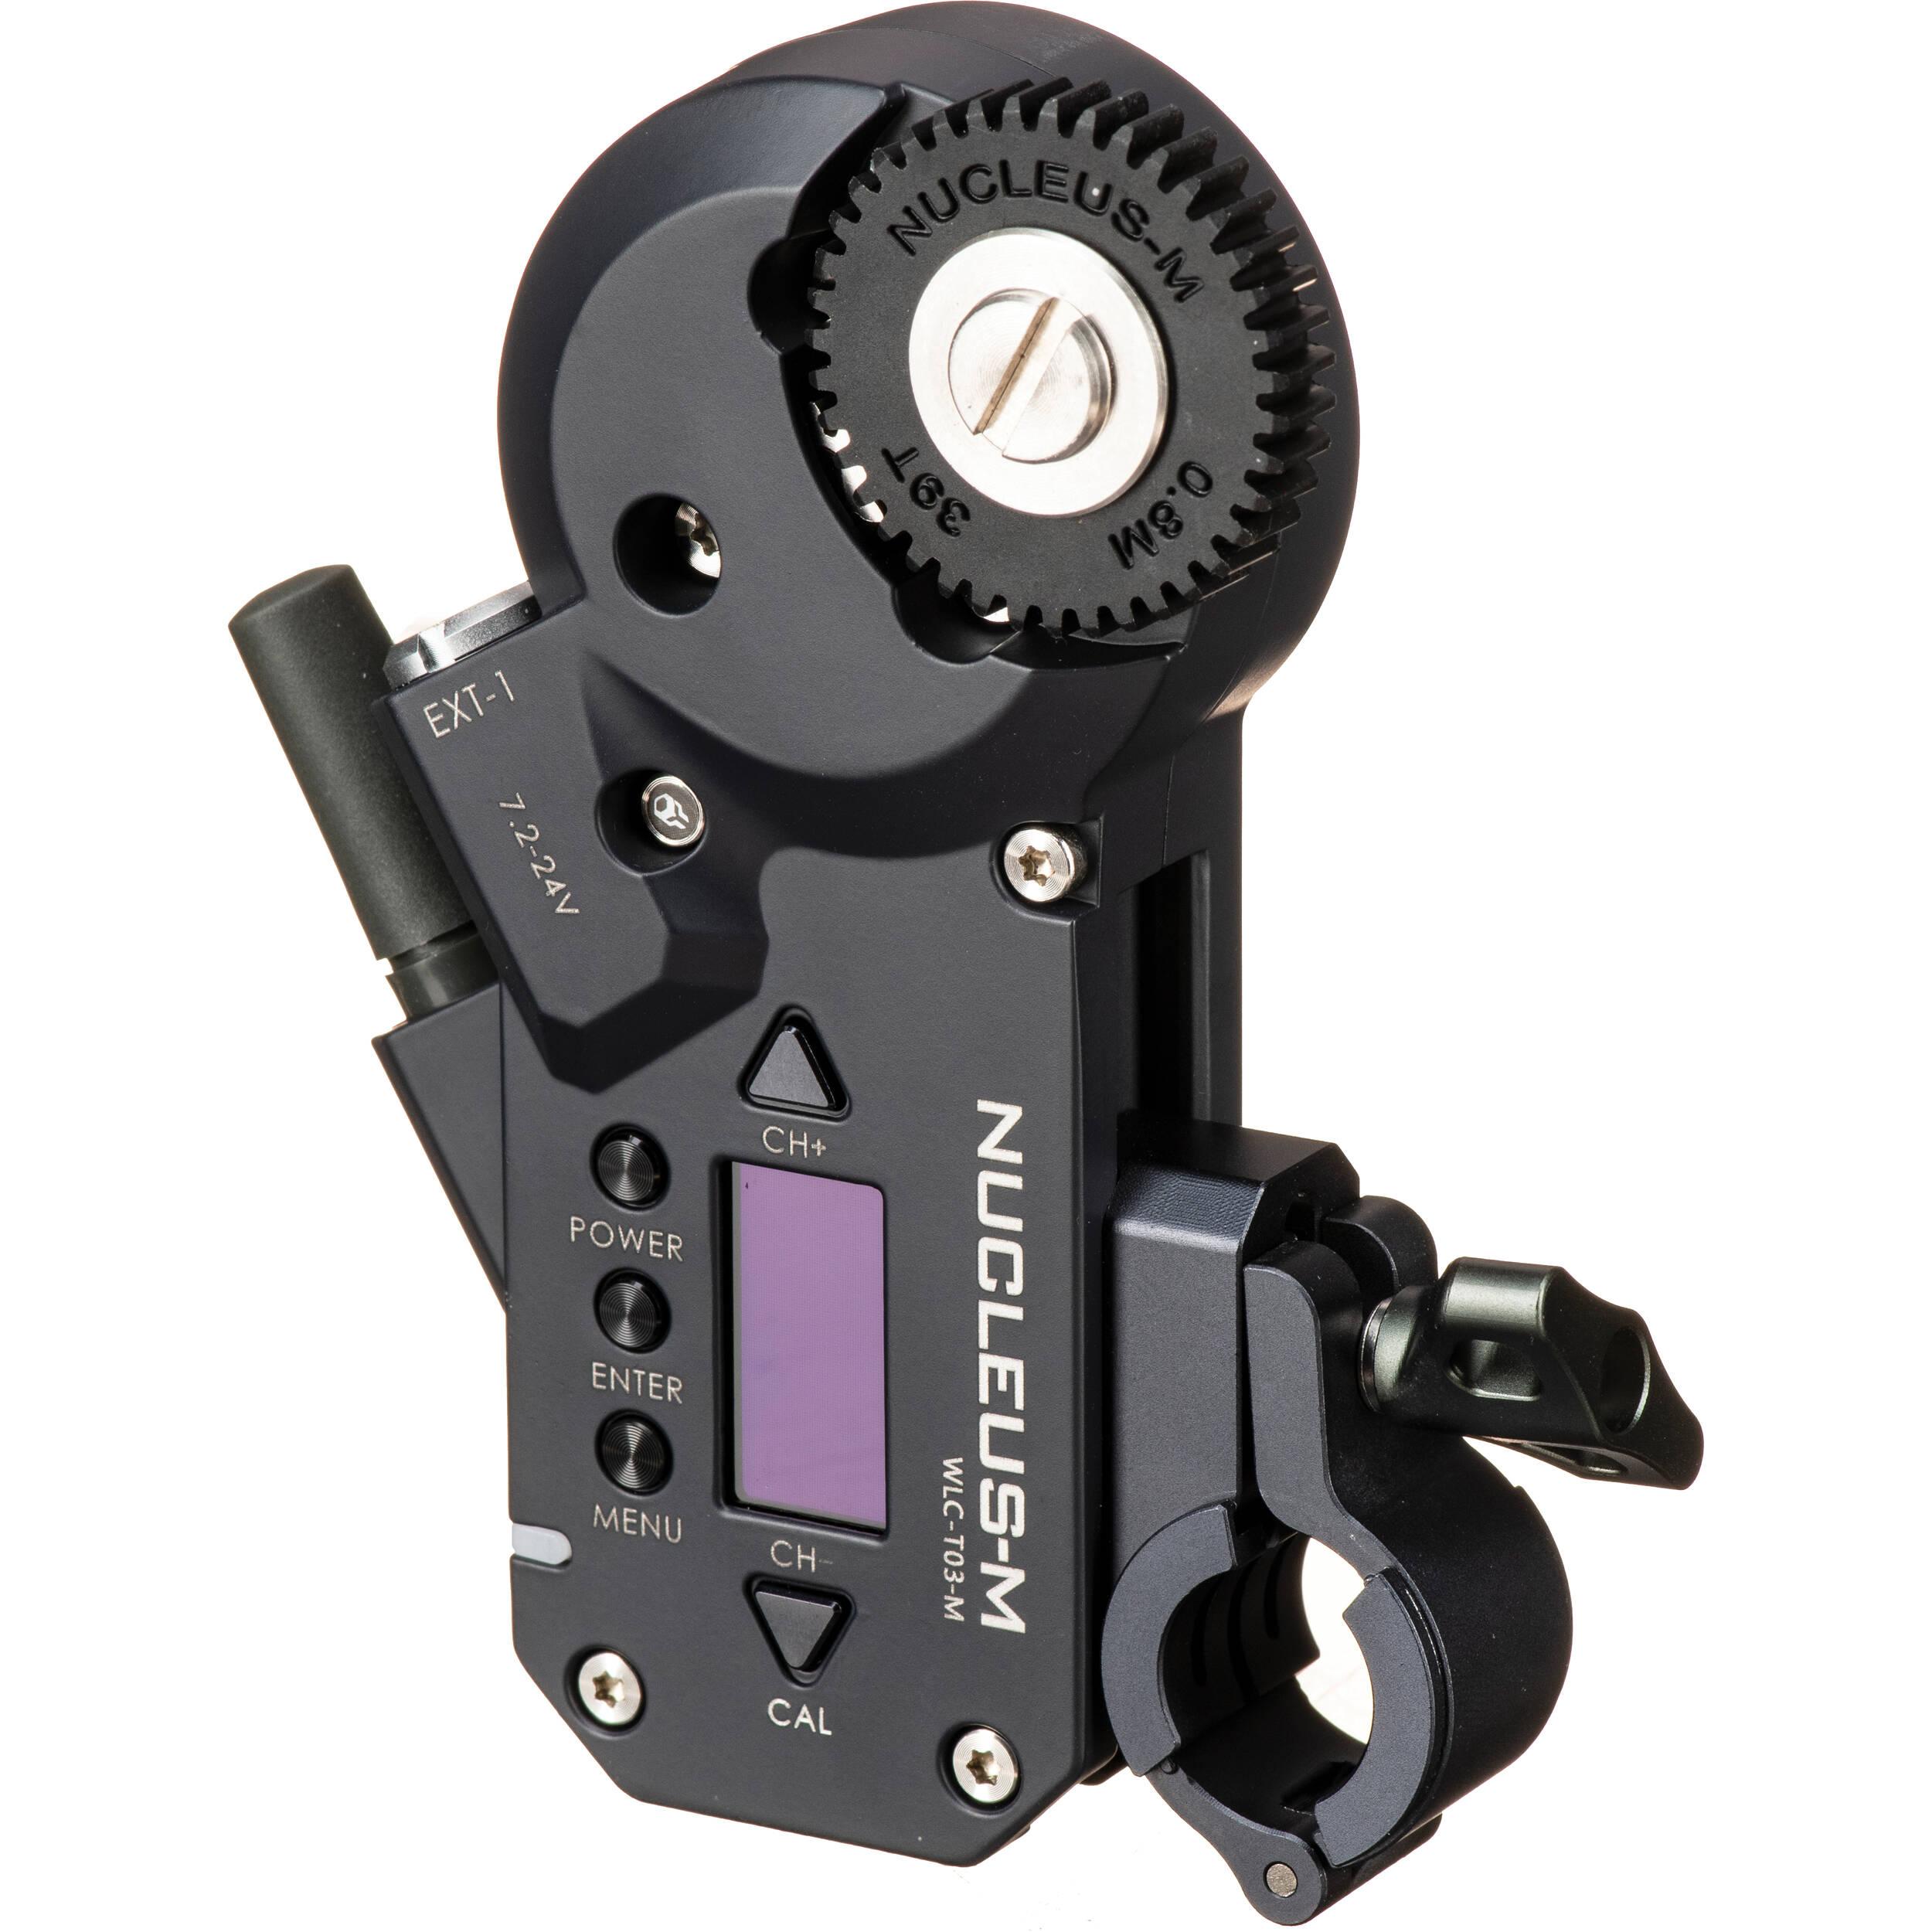 TiLTA WLC-T03-M-K1 Nucleus-M Motor Nucleus-M Motor Kit I 7-Pin to 7-Pin Motor Power Cable